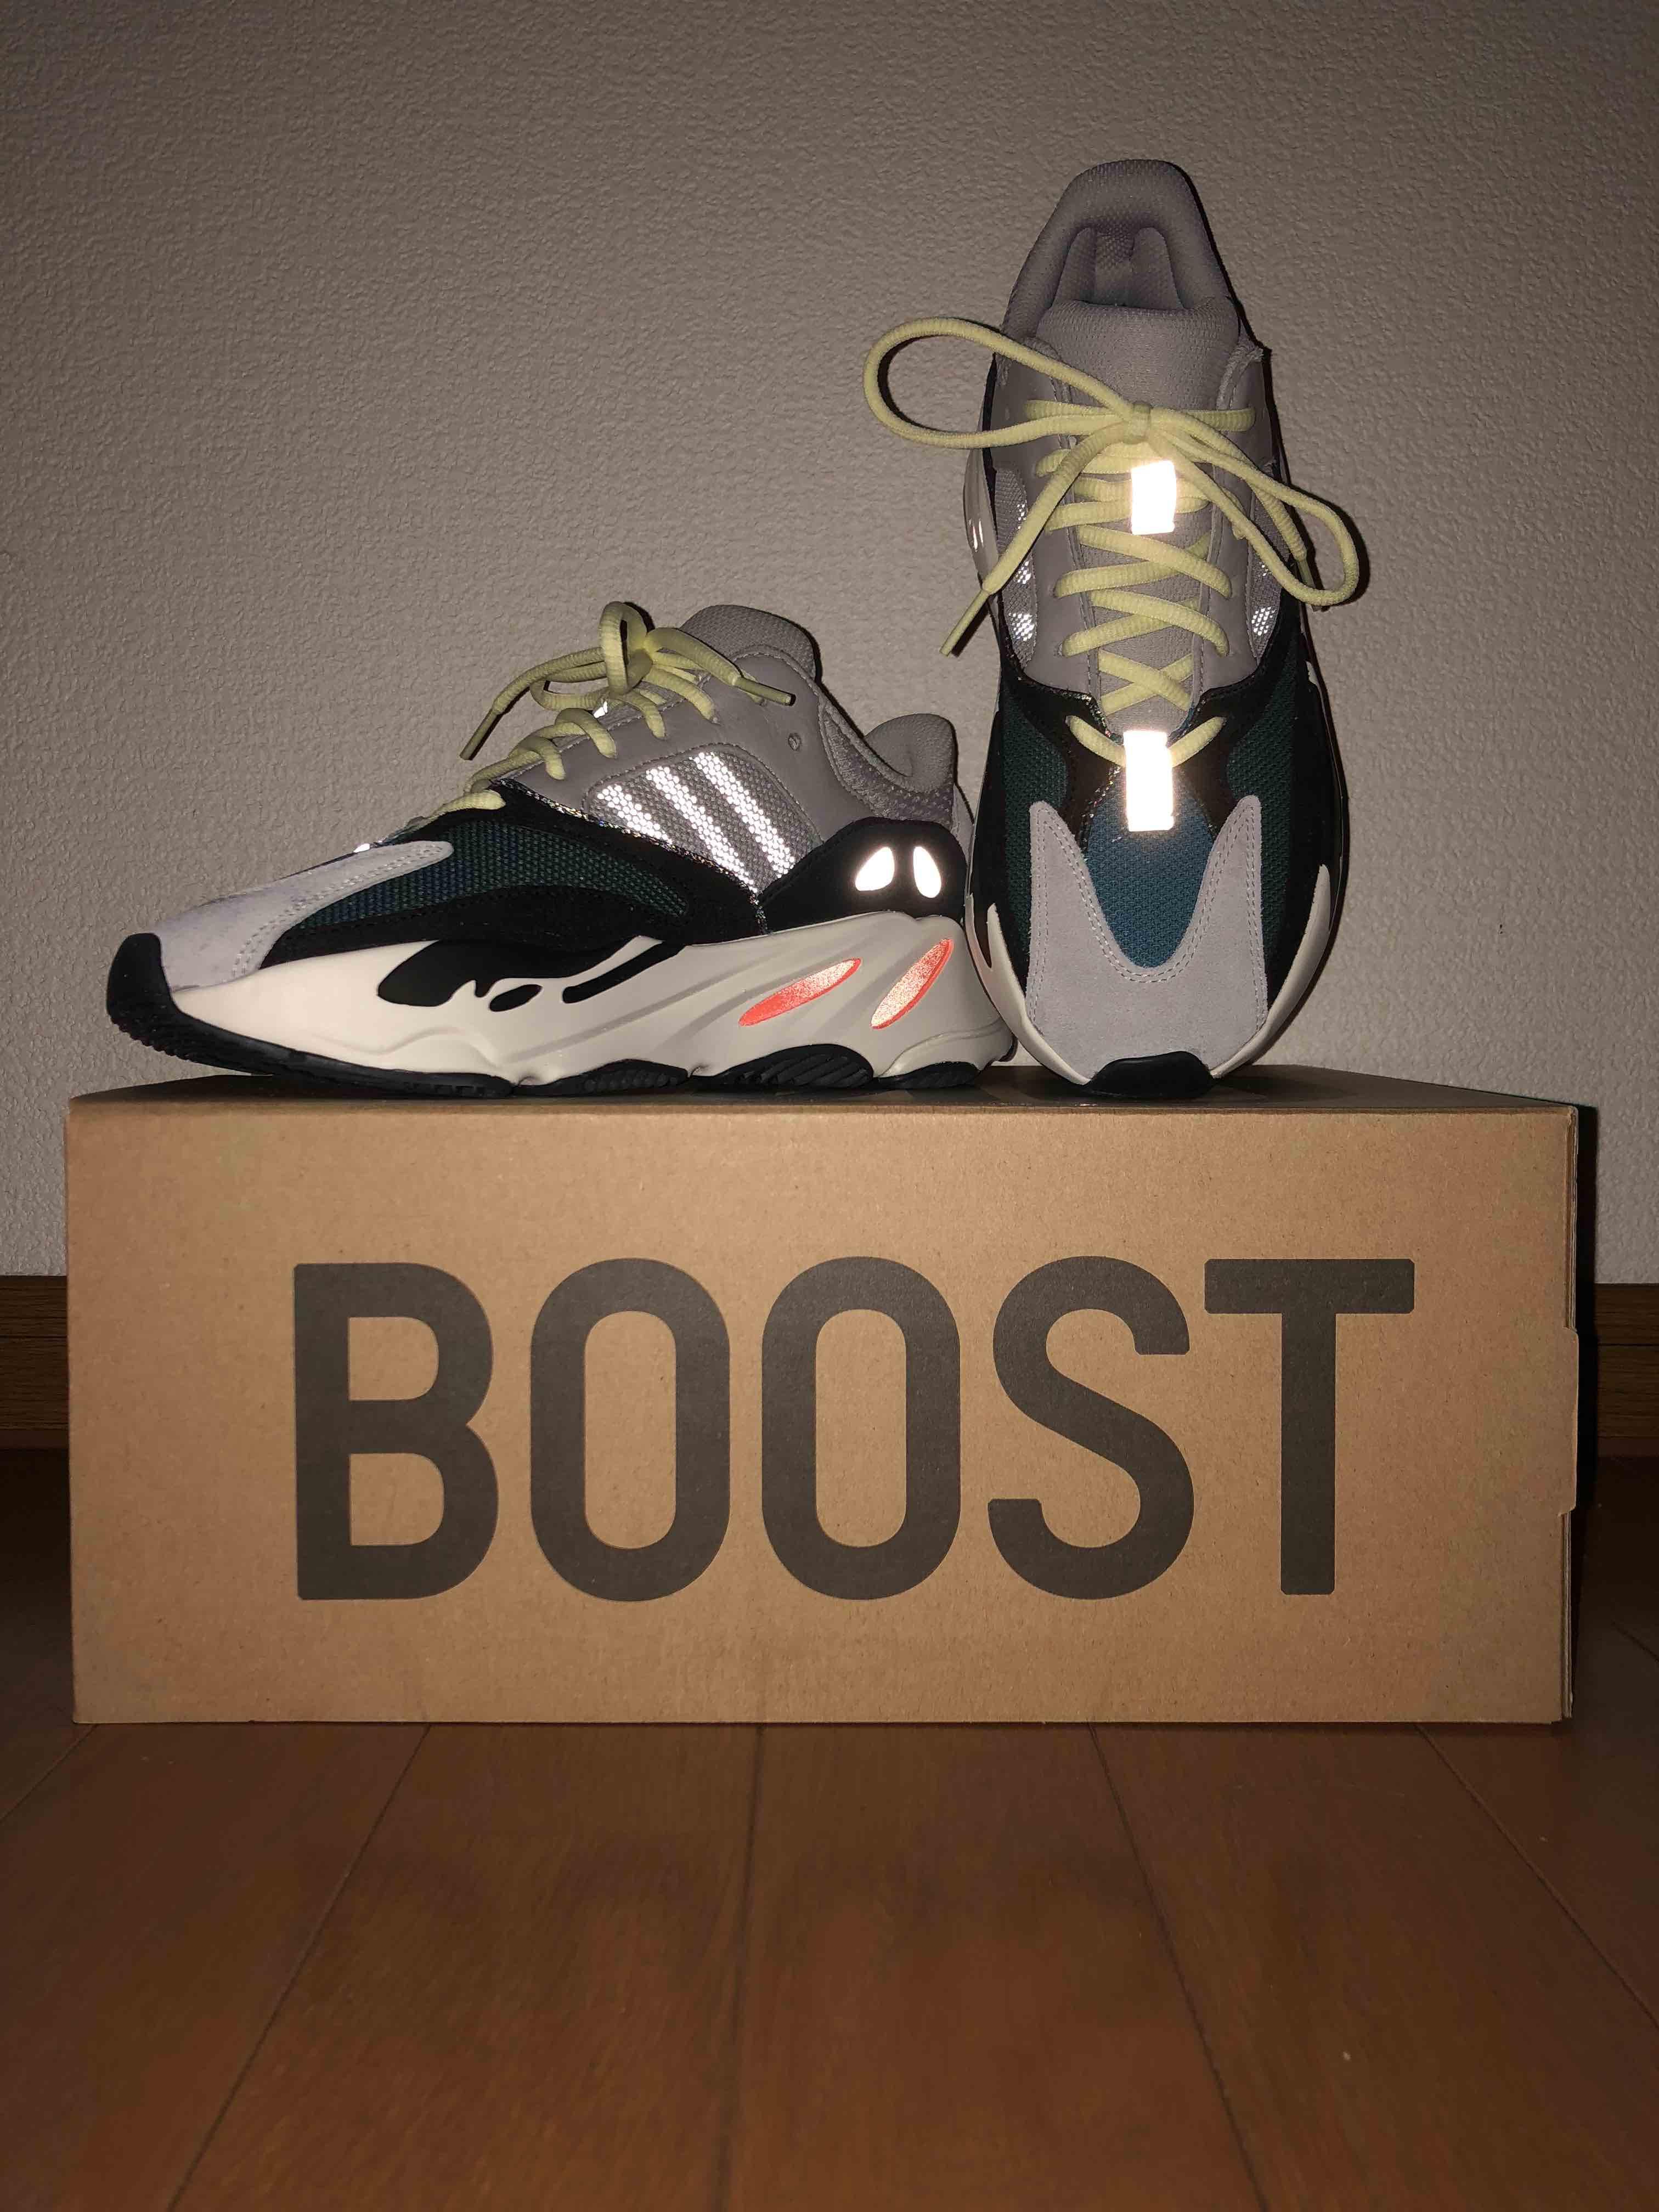 adidas、YeezyBoost700のOGです! 海外でのみ発売してるとき